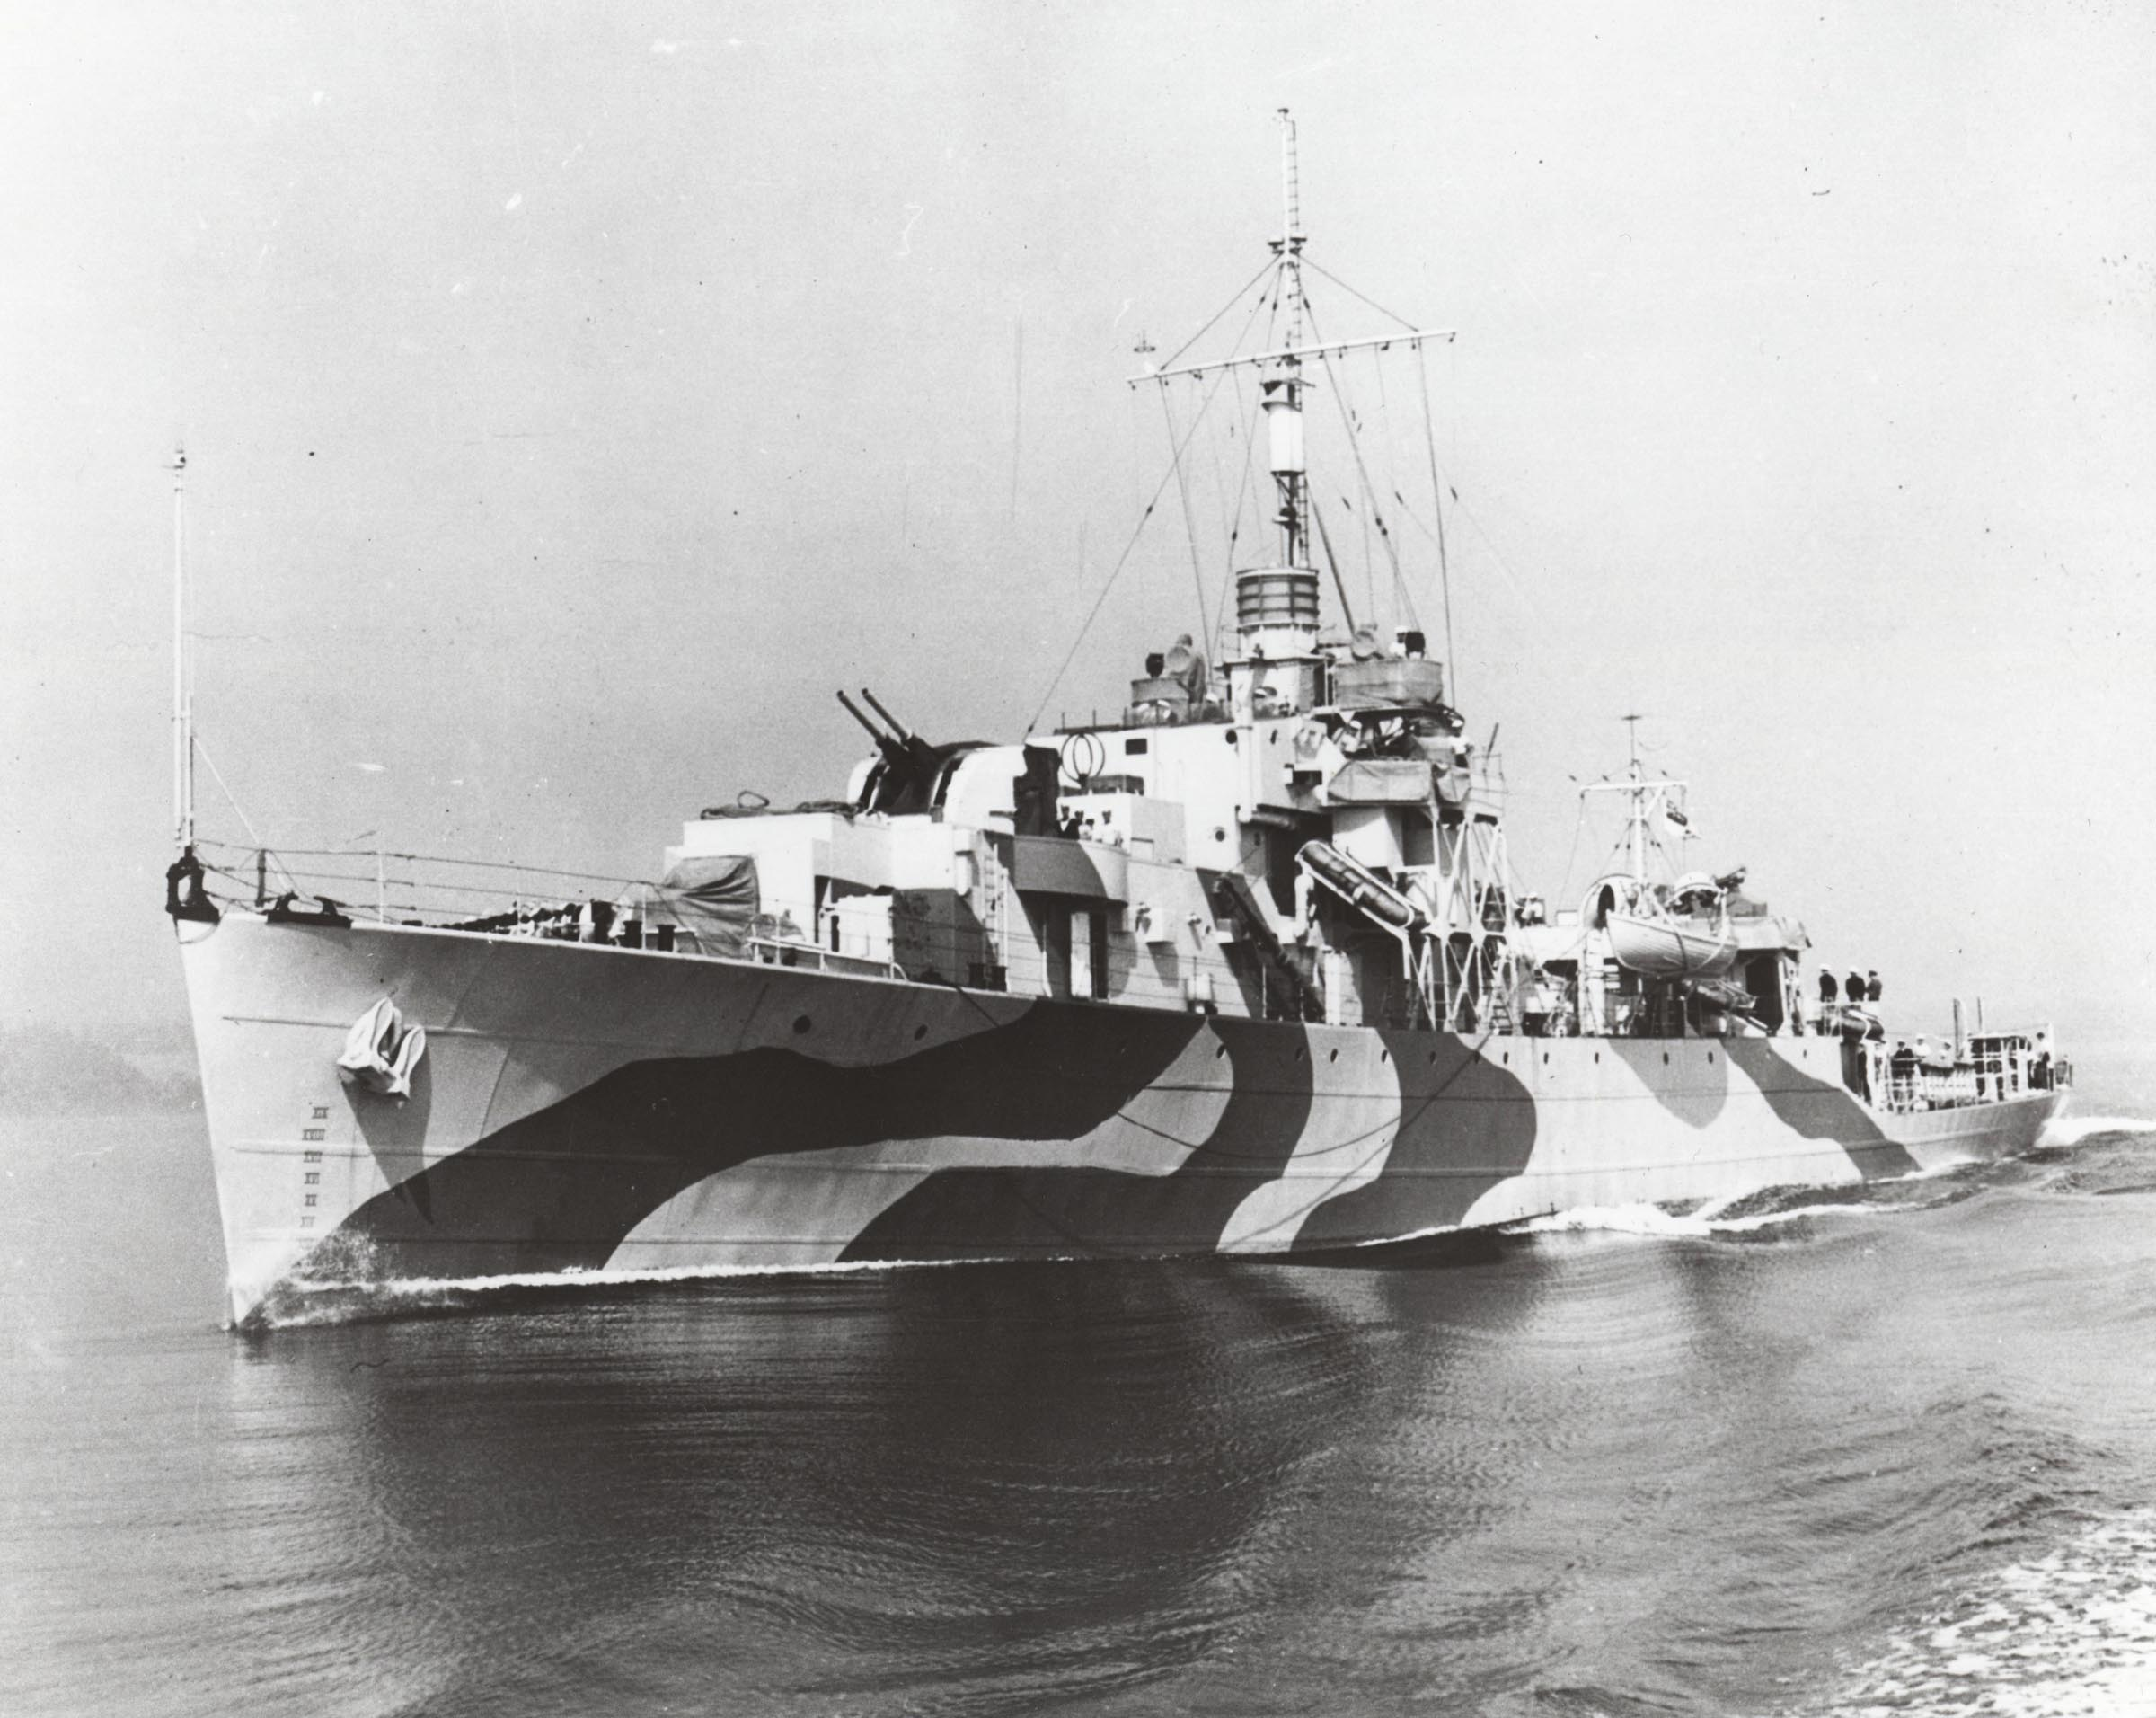 HMCS CAPILANO